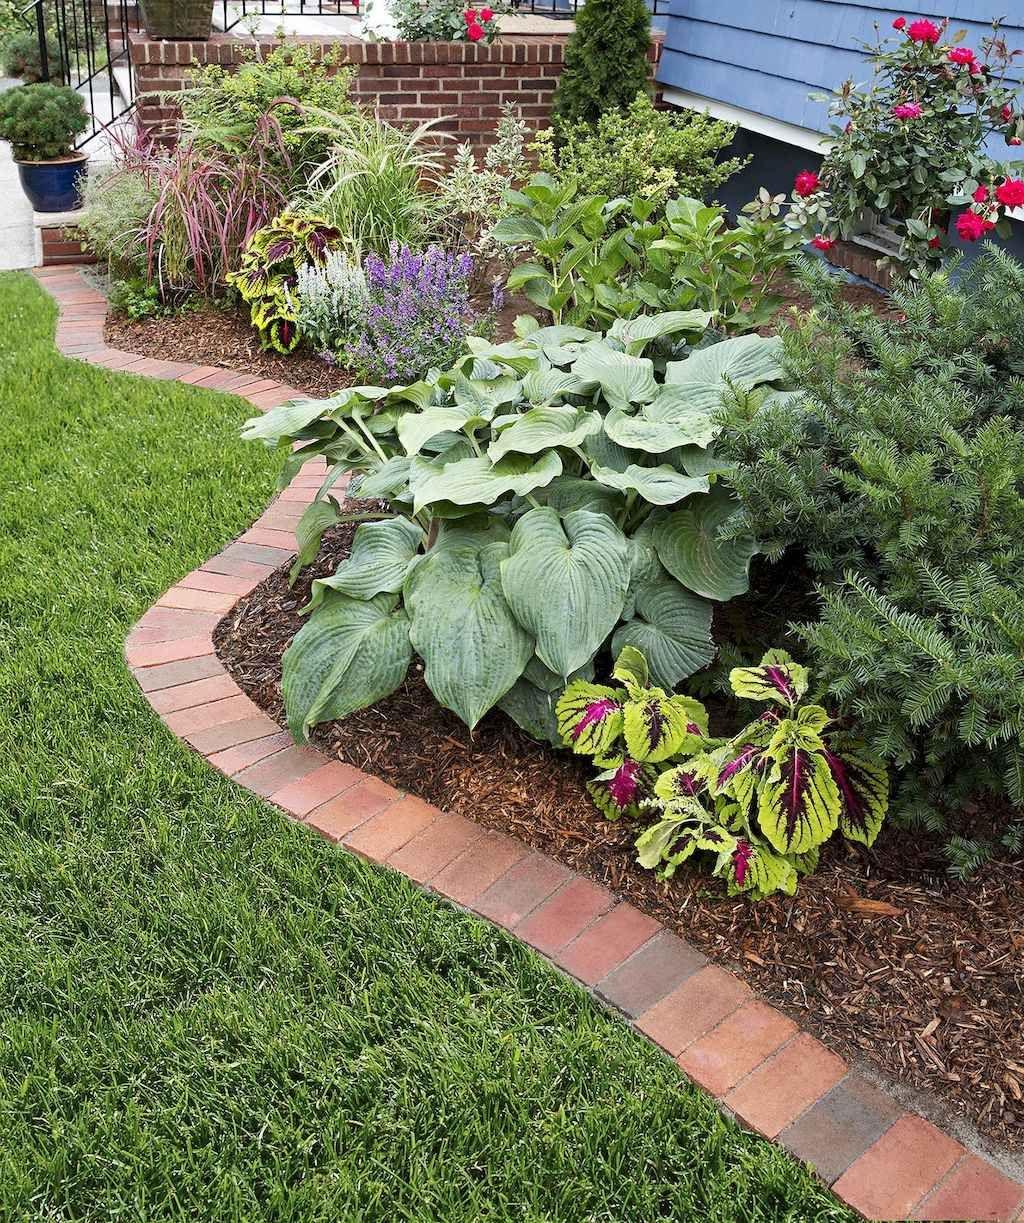 36 Simple Cheap Diy Garden Bed Edging Ideas For Your Garden Brick Garden Edging Brick Garden Garden Edging